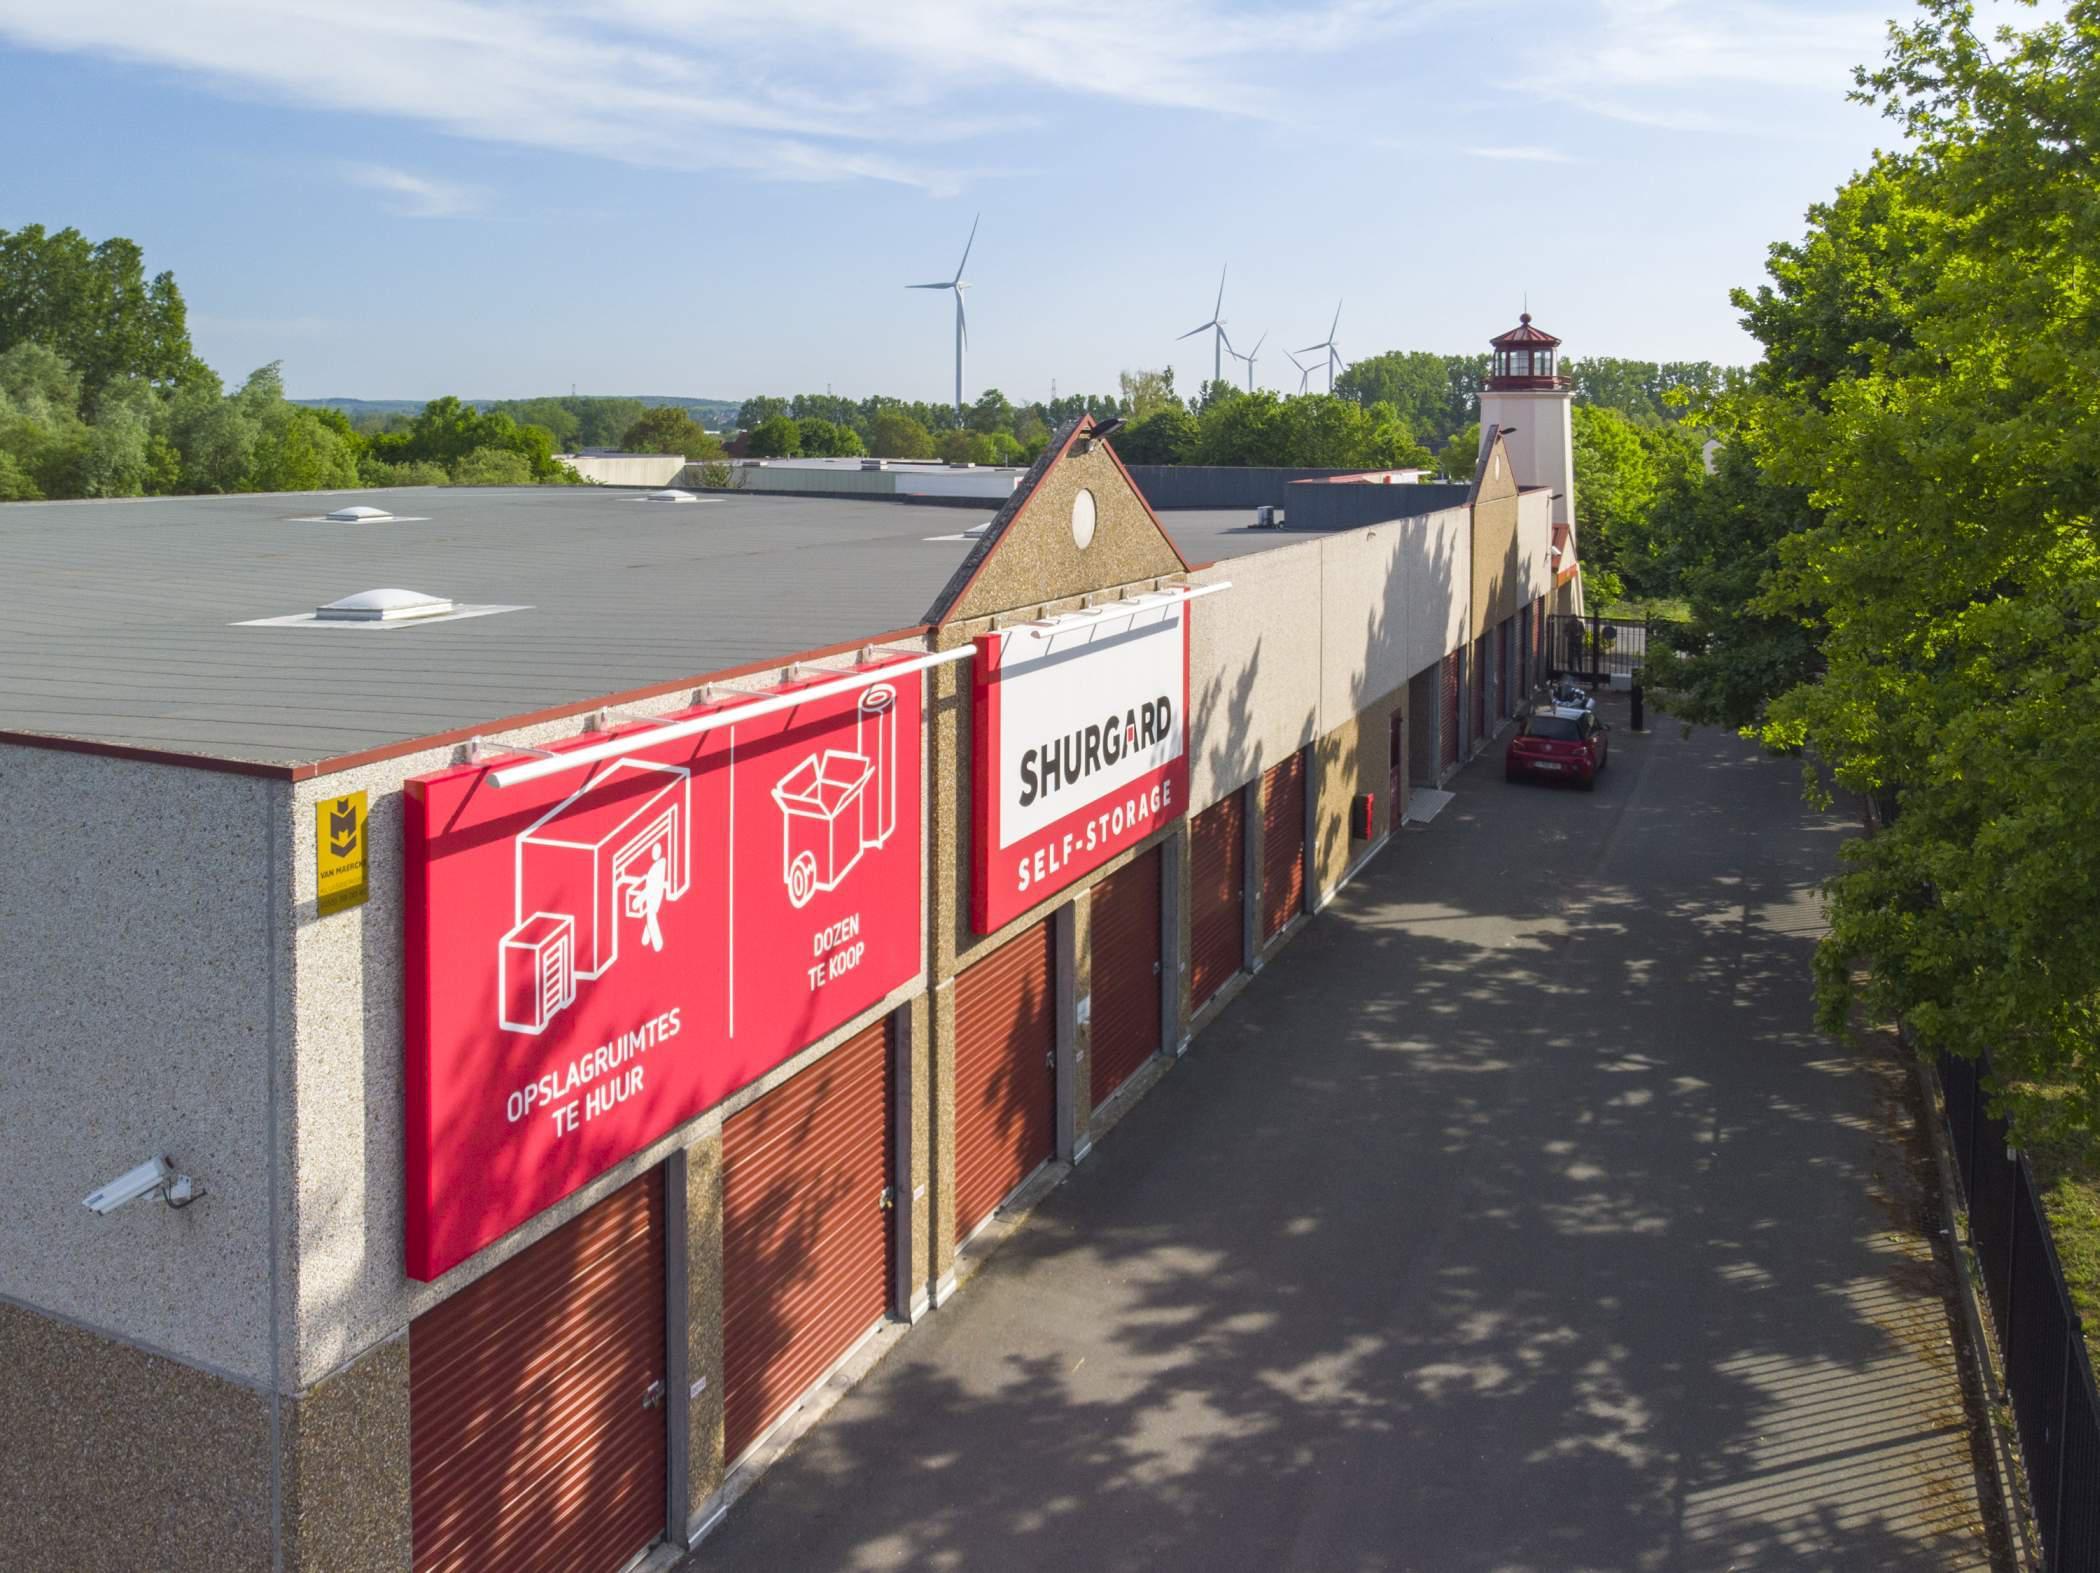 Shurgard Self-Storage Sint-Pieters-Leeuw